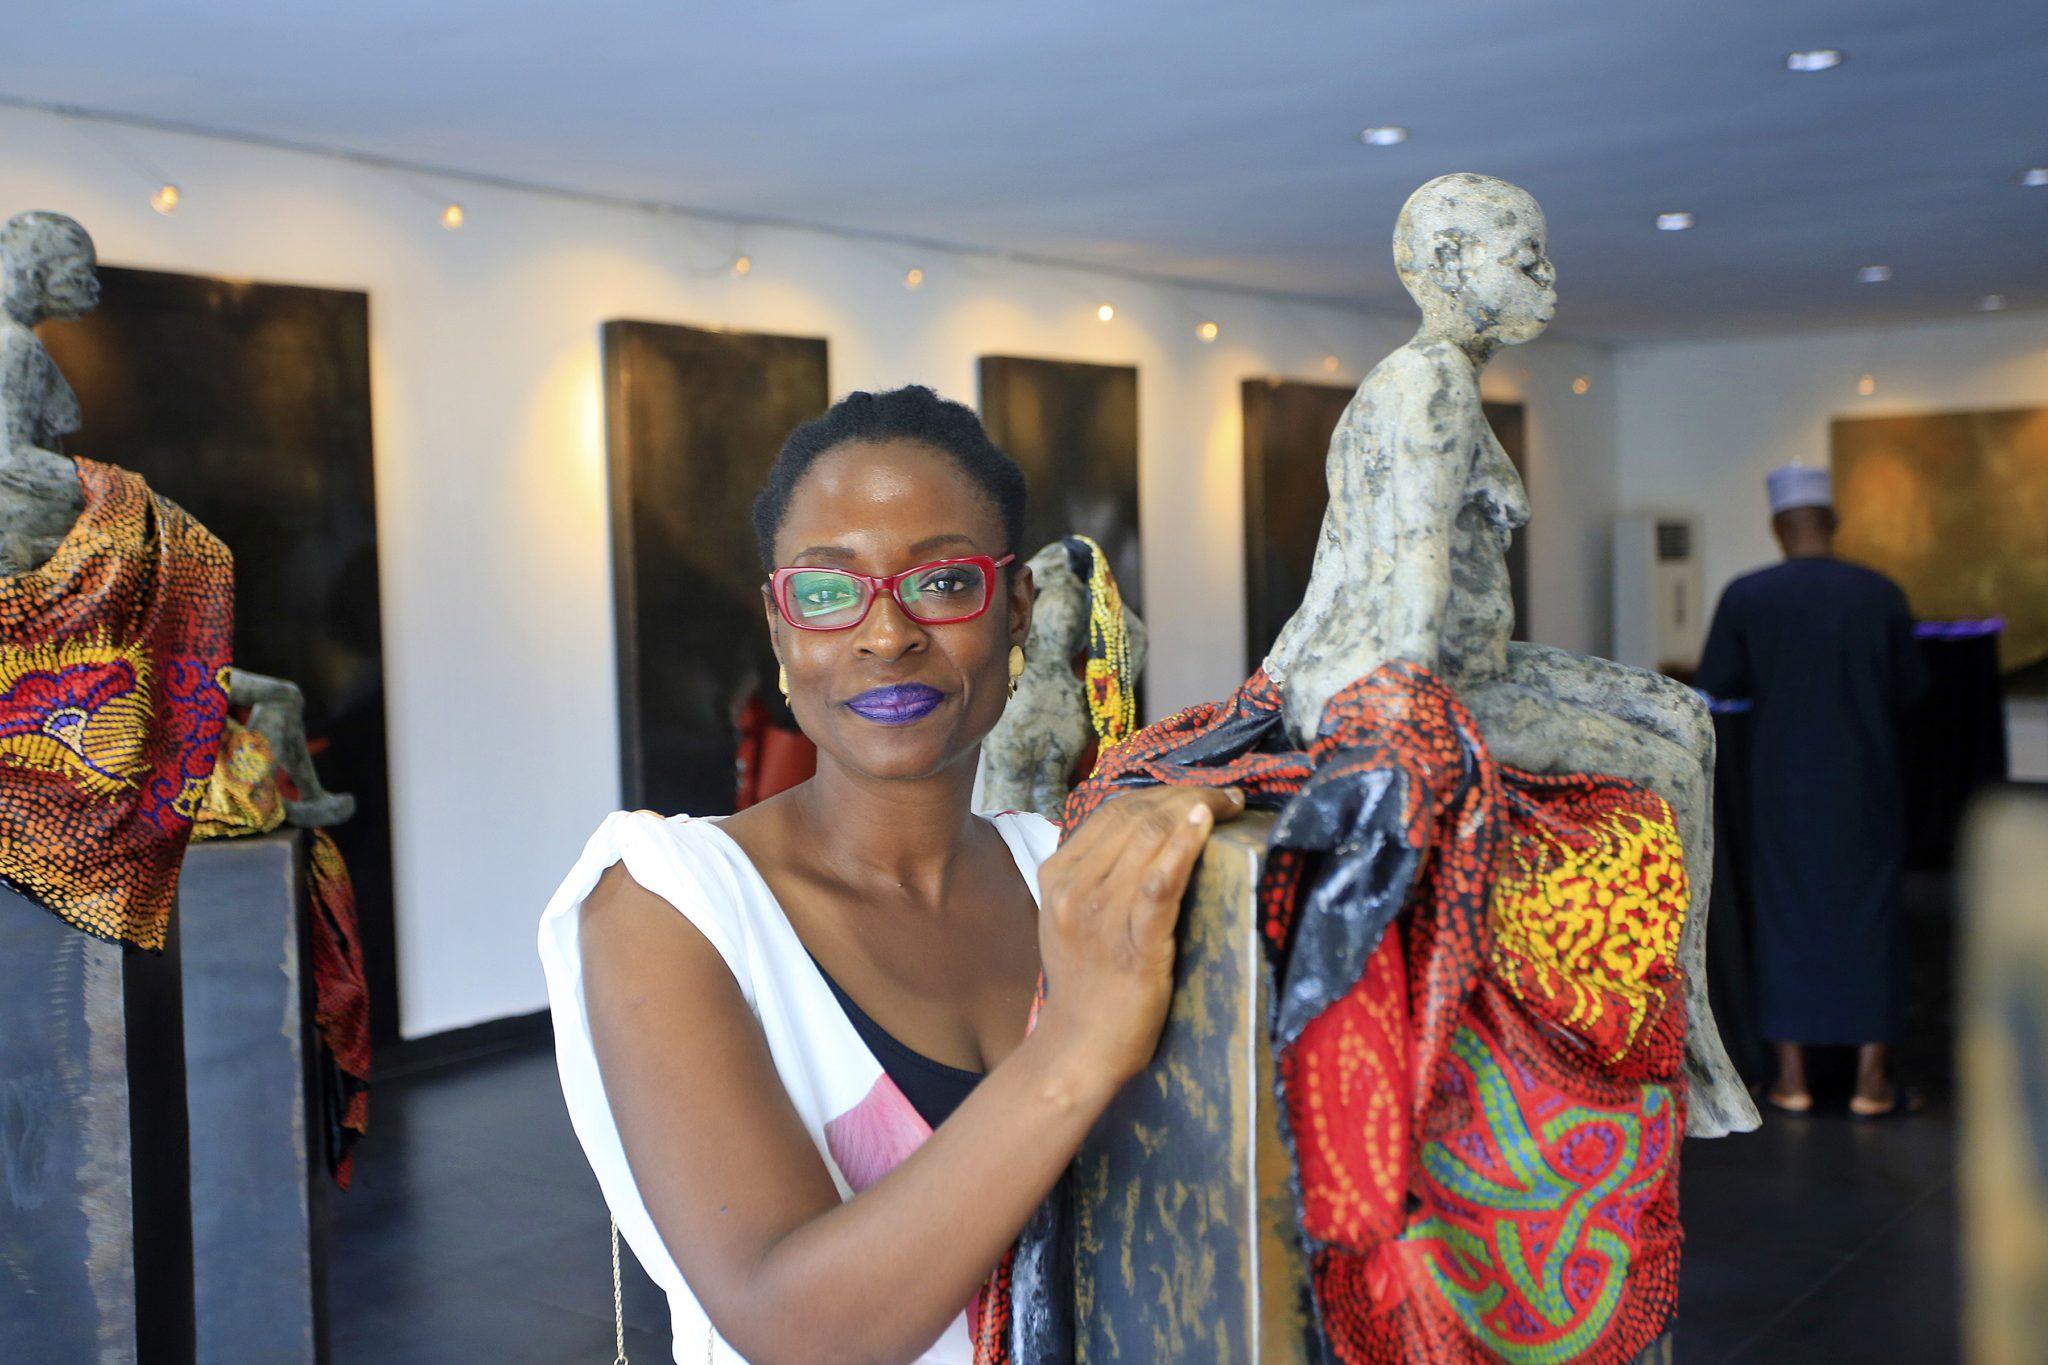 Prestigious annual FNB Art Prize awarded to Peju Alatise